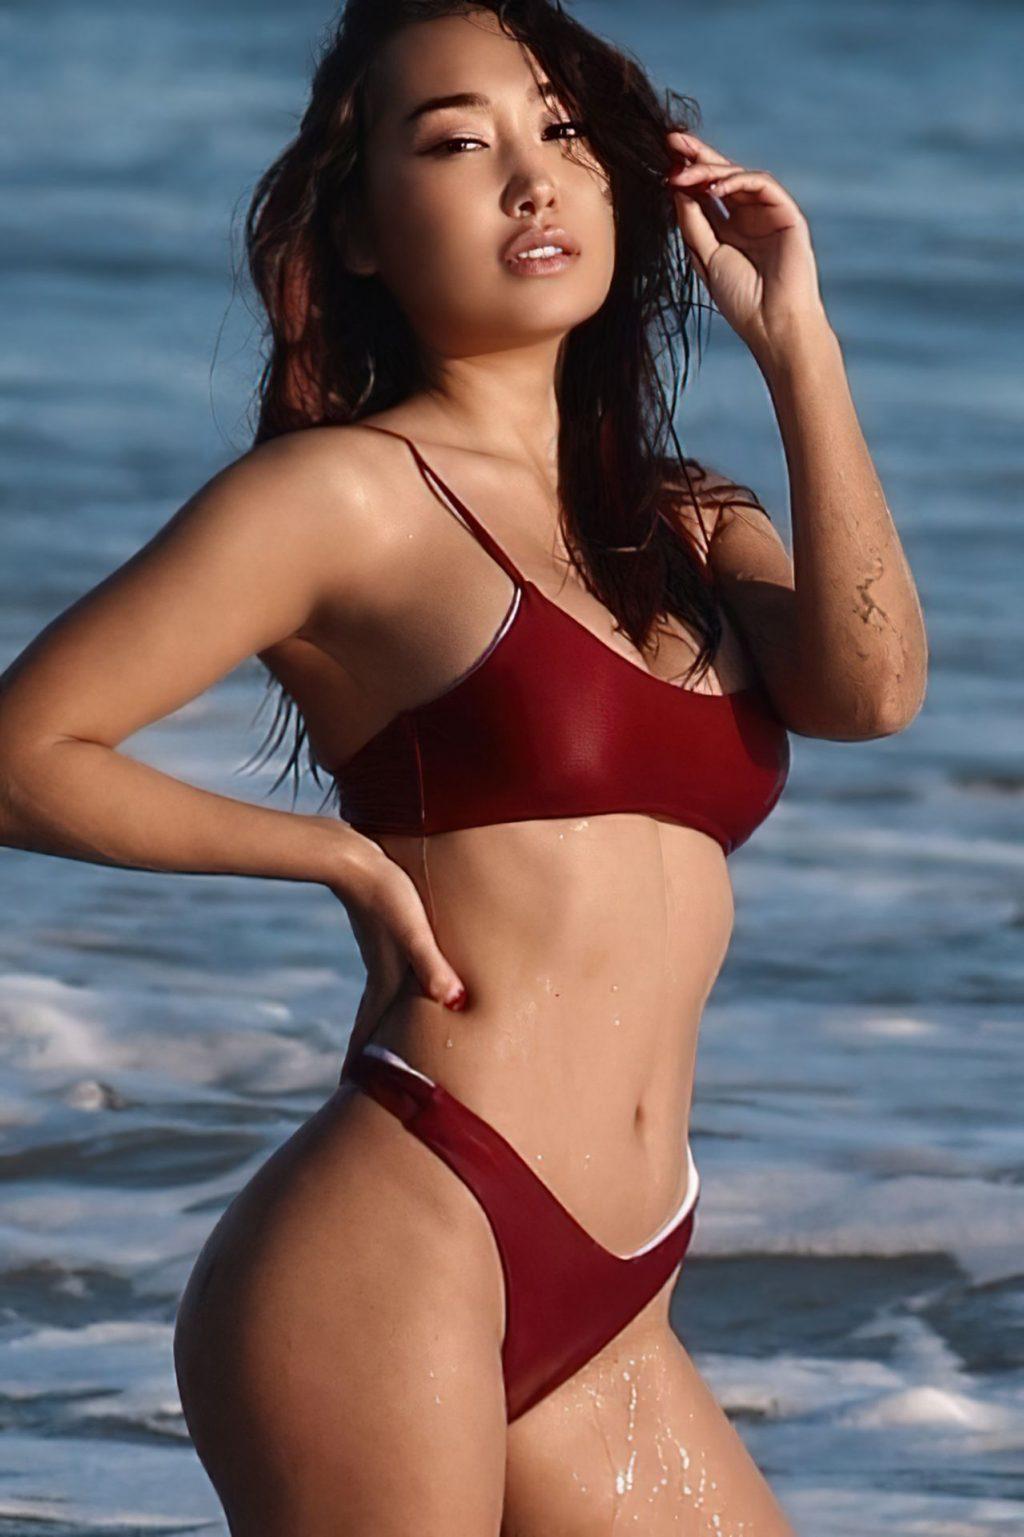 Nora Kyzy Shows Off Her Sexy Body in a Bikini (47 Photos)